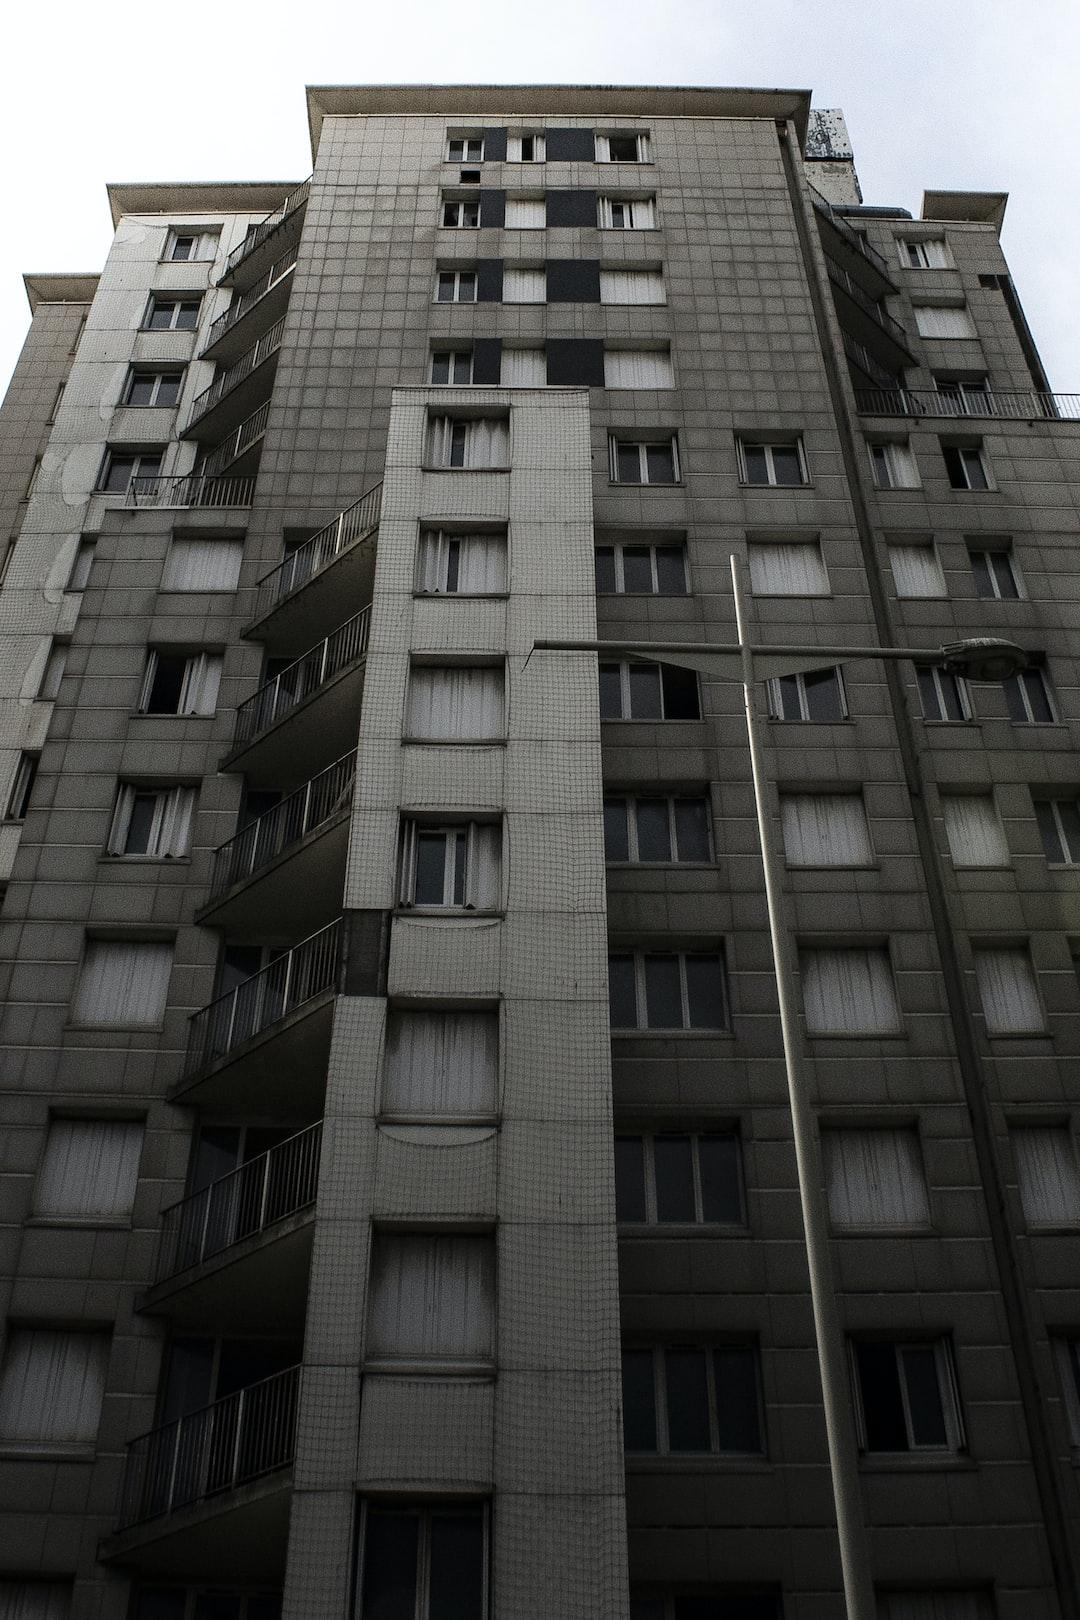 Concrete tower